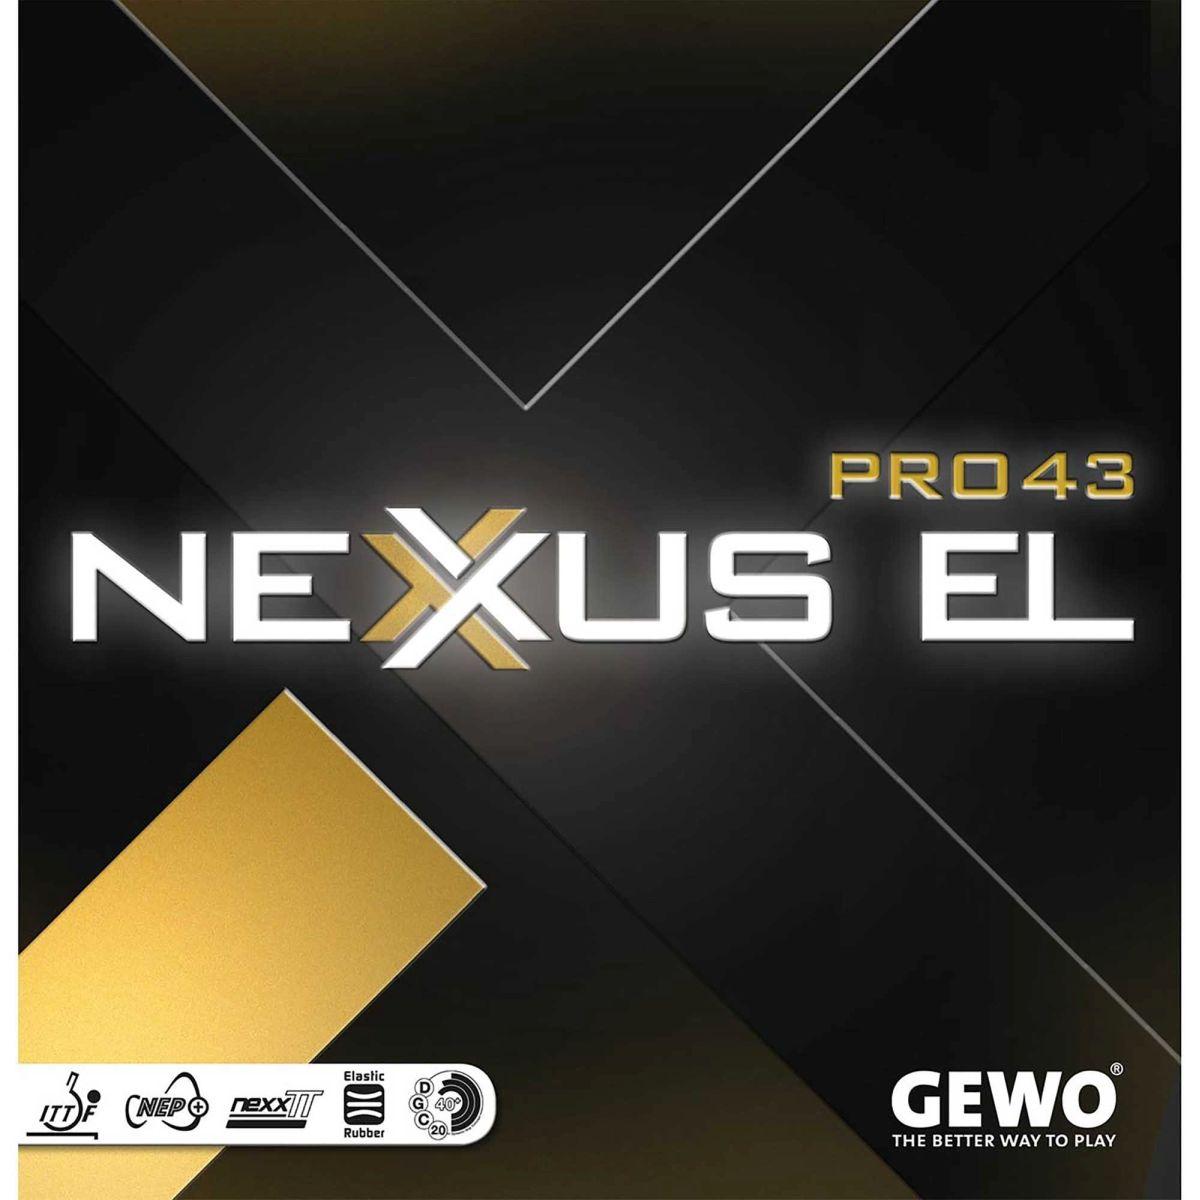 Gewo Nexxus EL Pro 43 Rubber